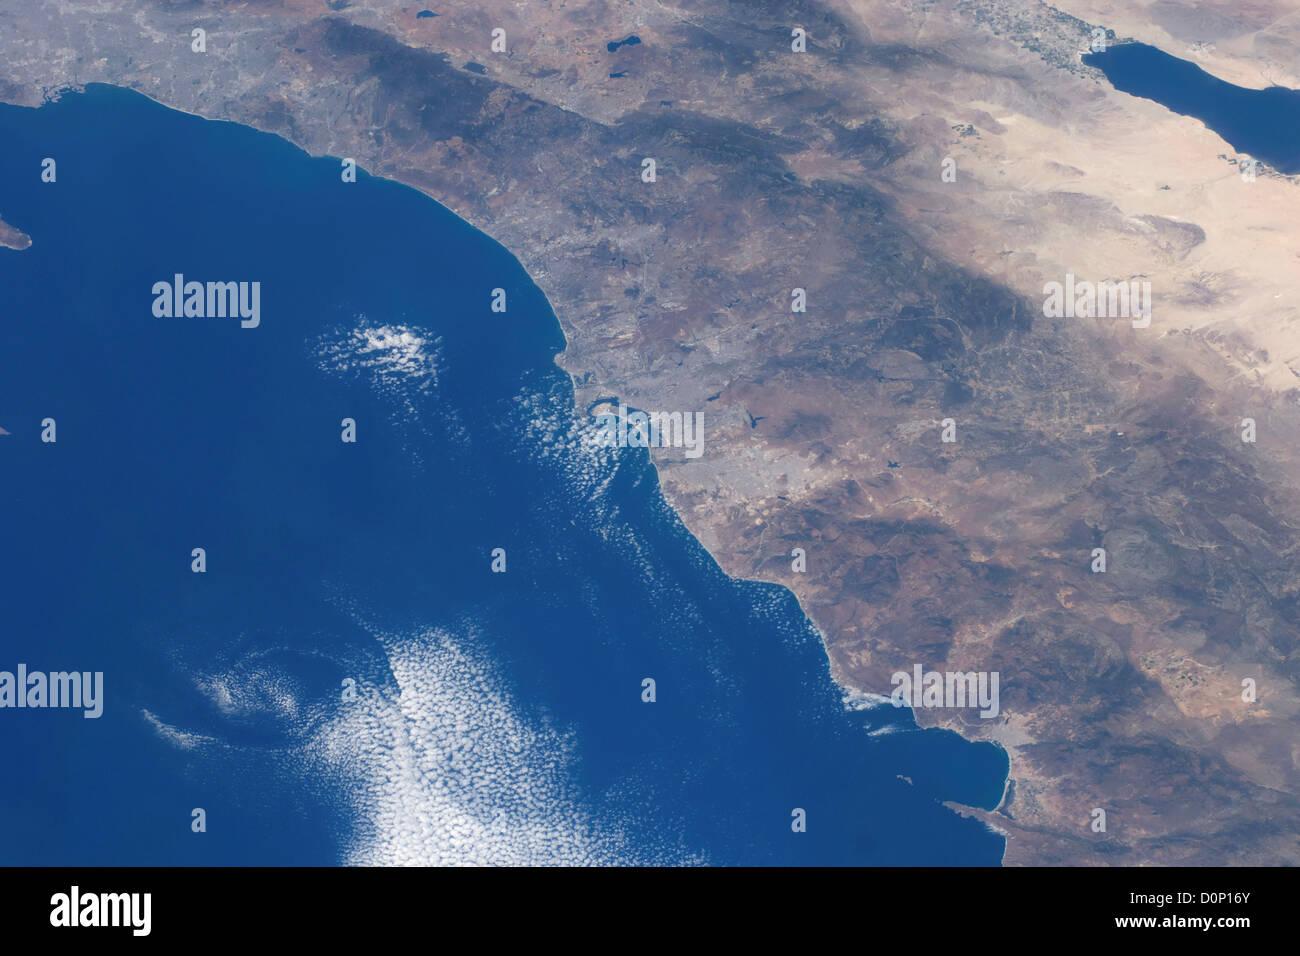 San Diego from Orbit - Stock Image